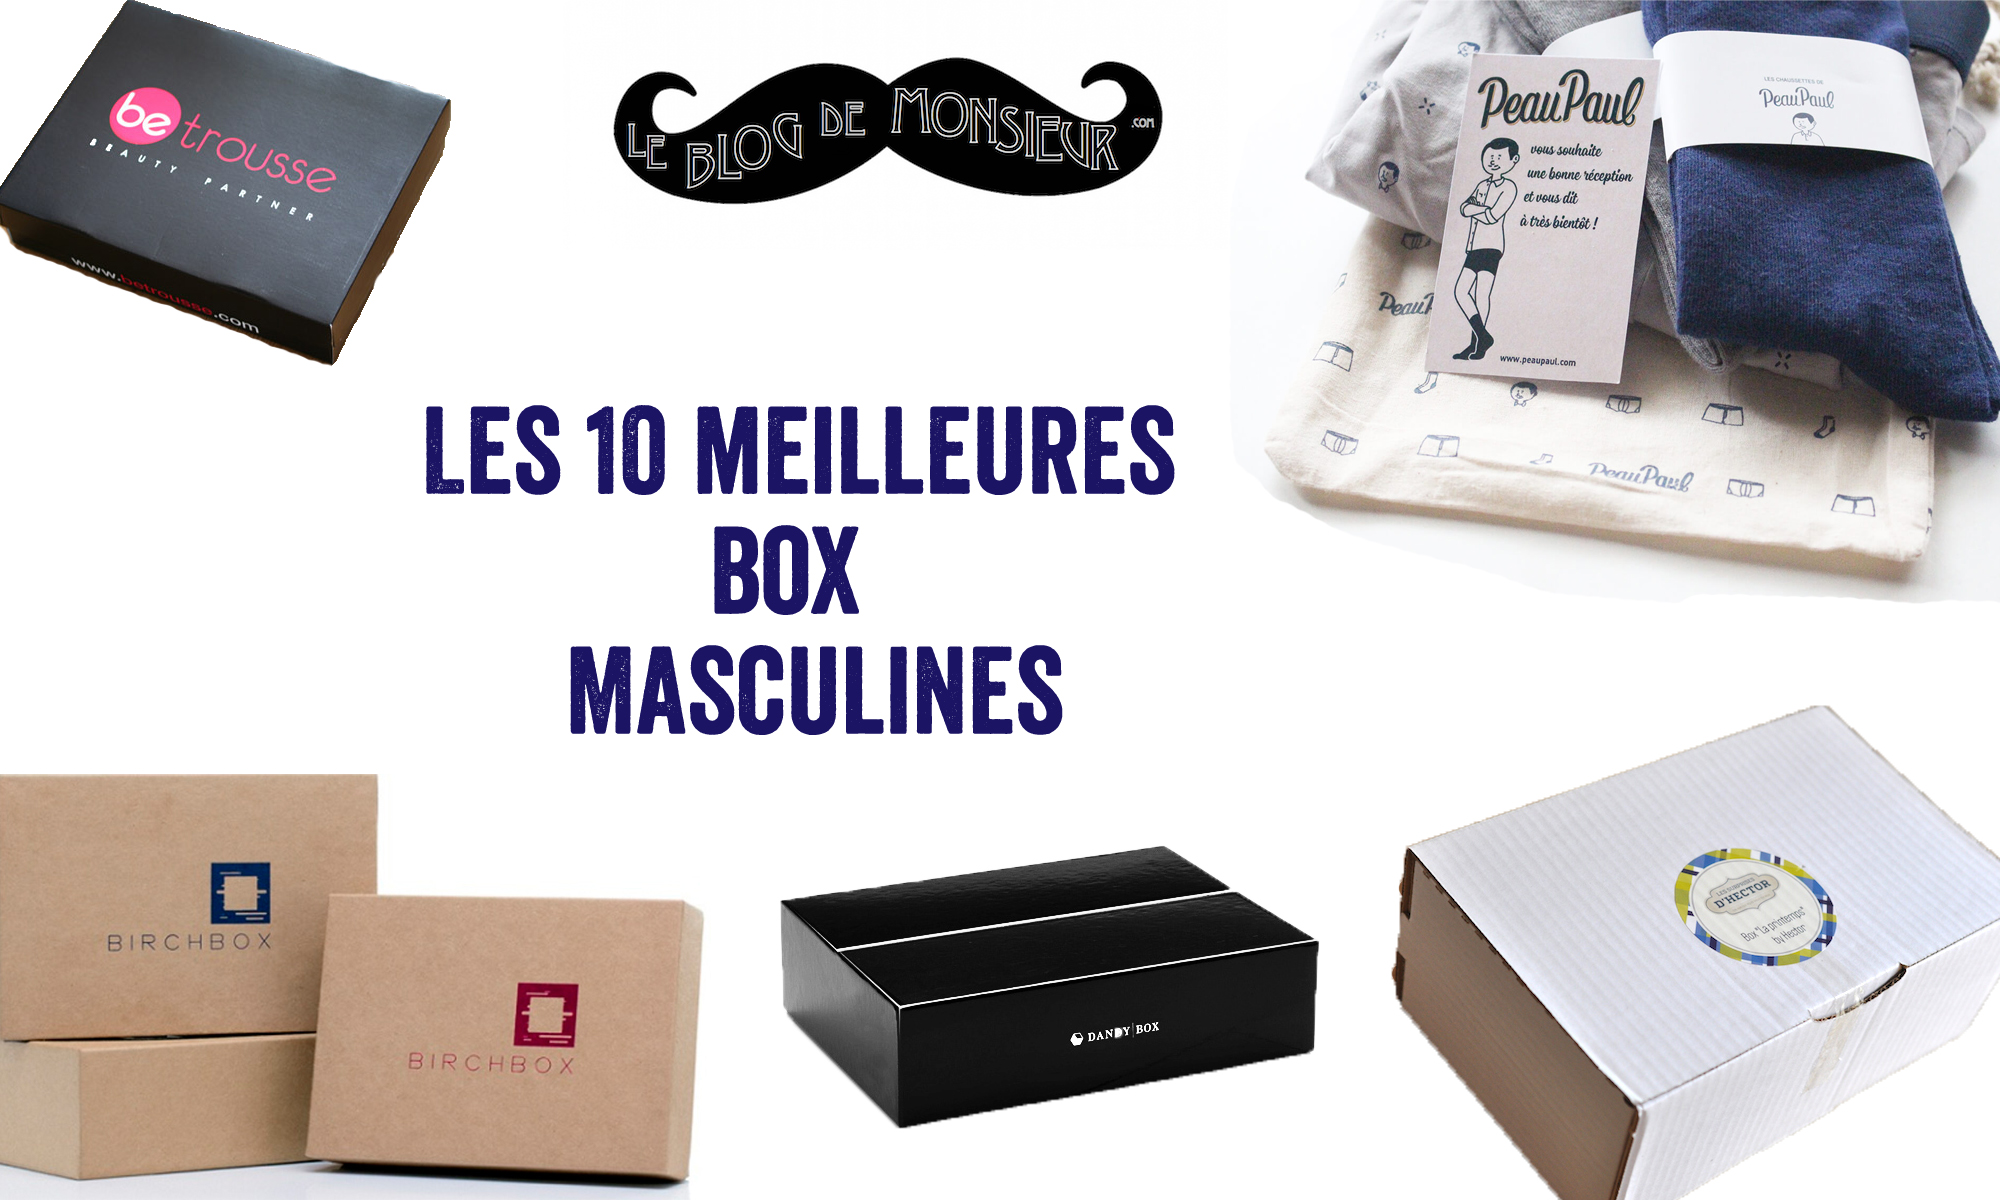 meilleures box masculines 1